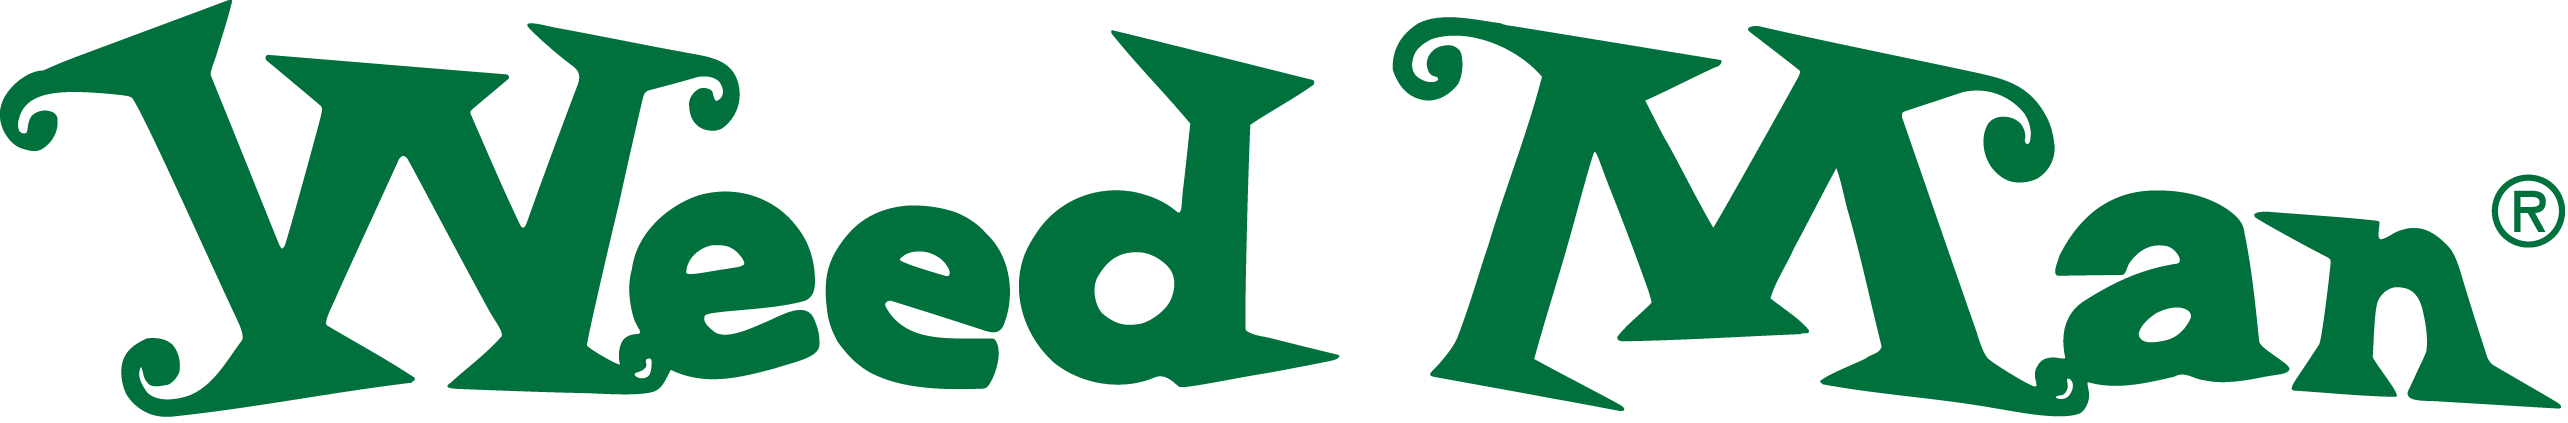 Weed Man Lawn Care logo